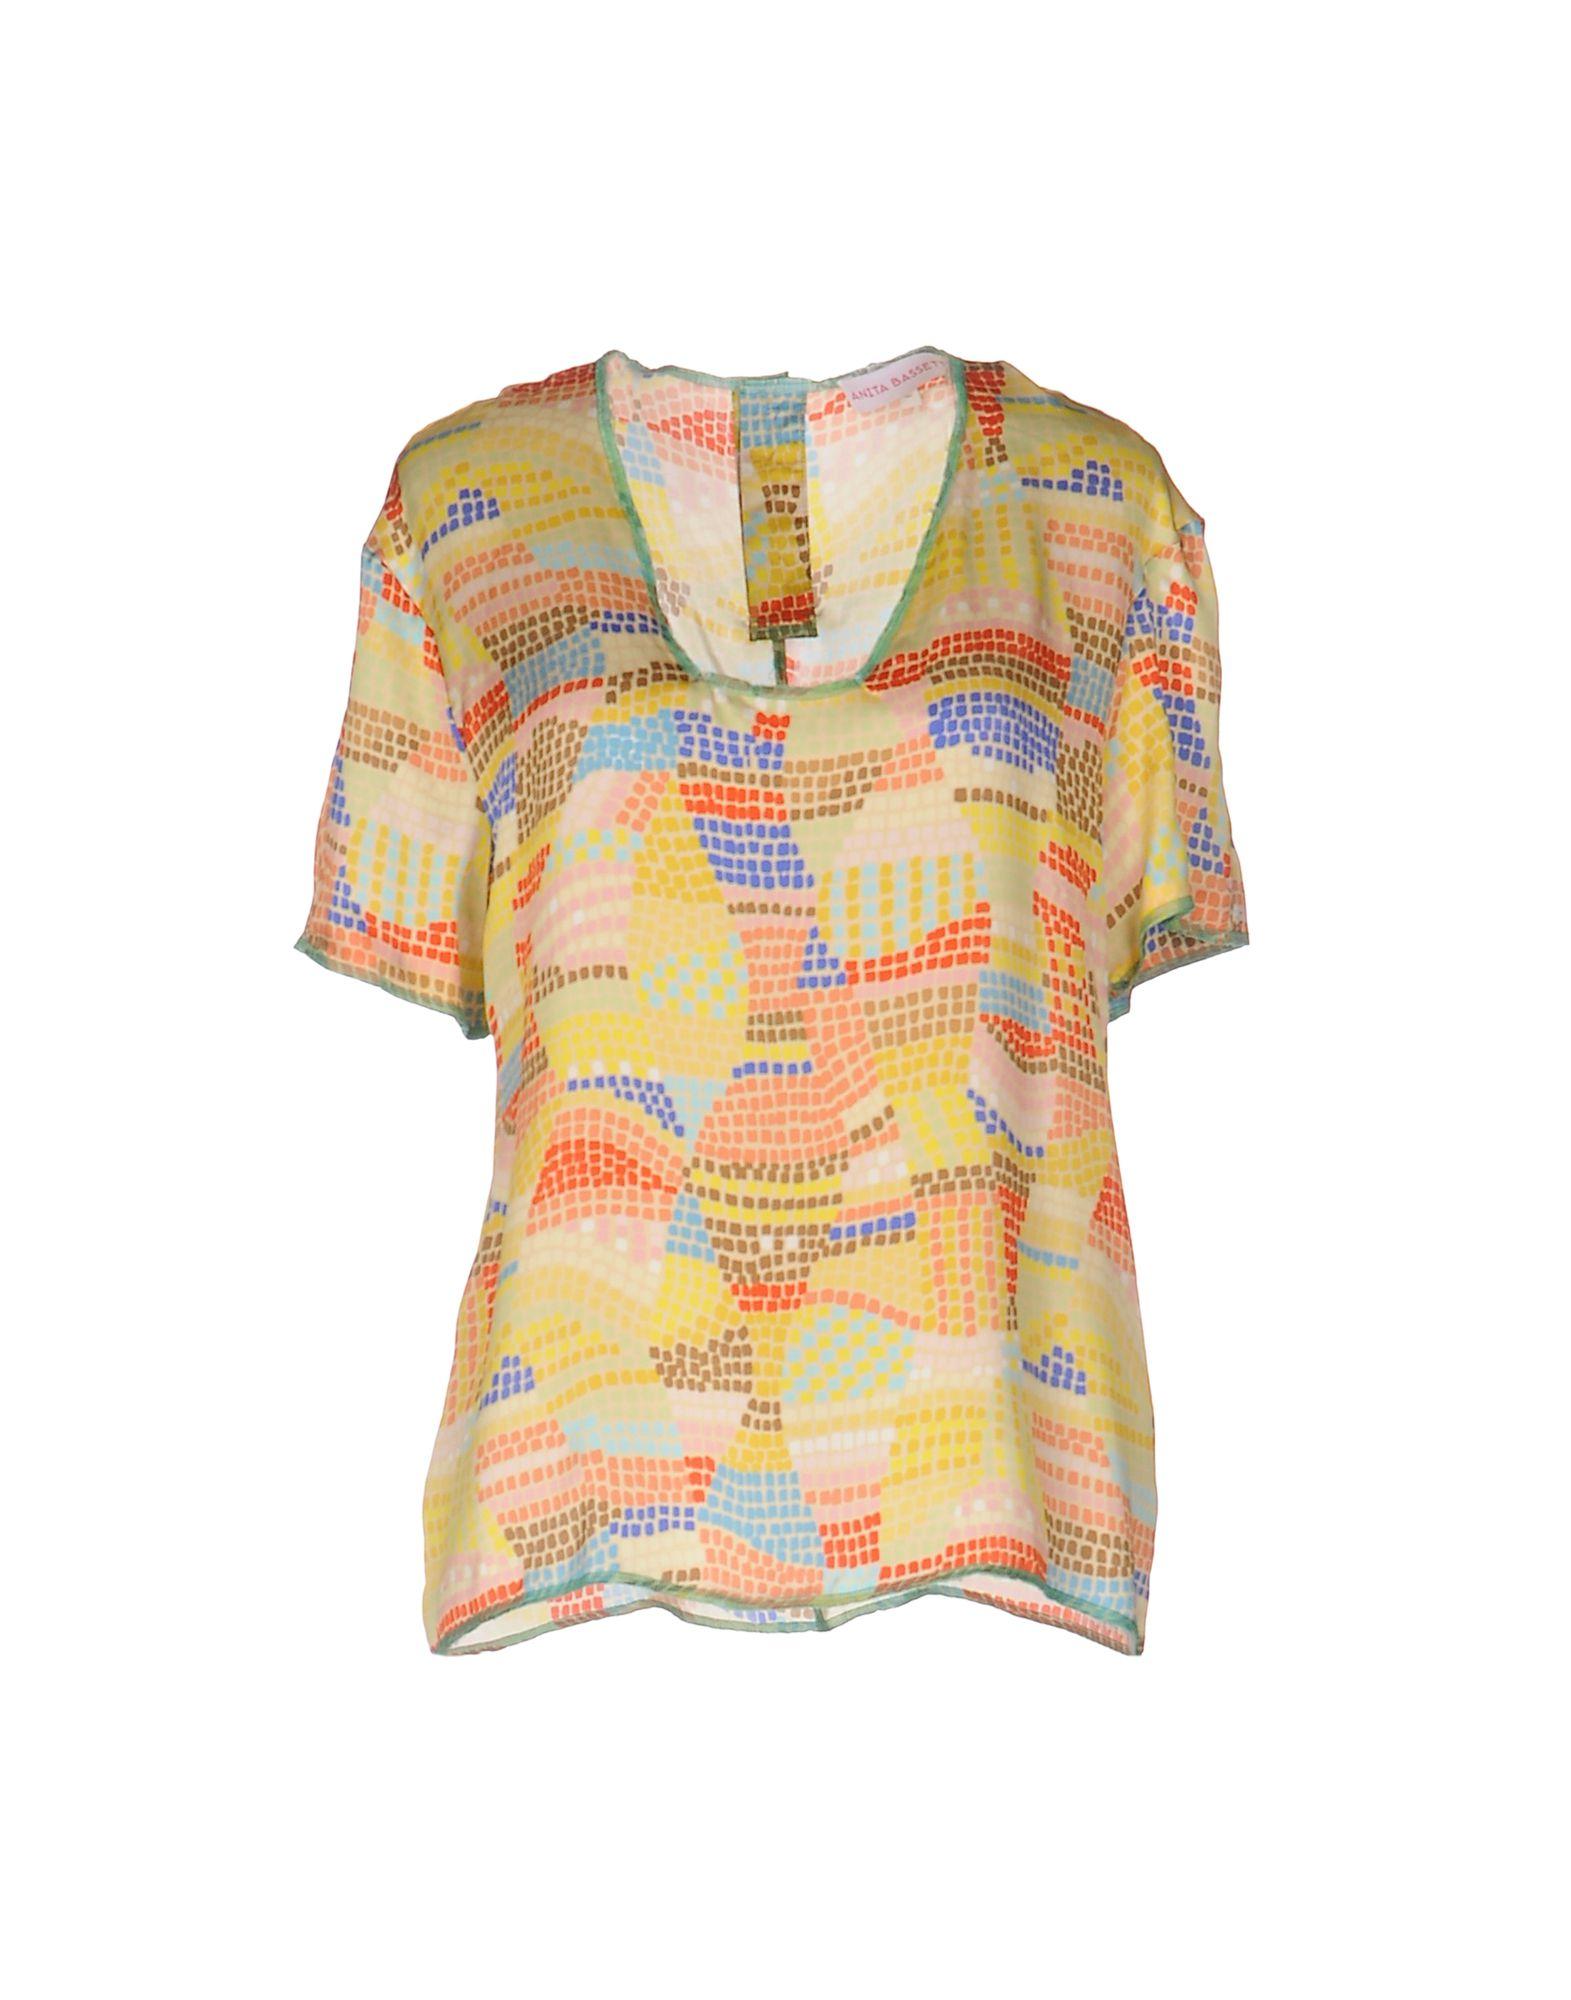 ANITA BASSETTI Damen Bluse Farbe Gelb Größe 3